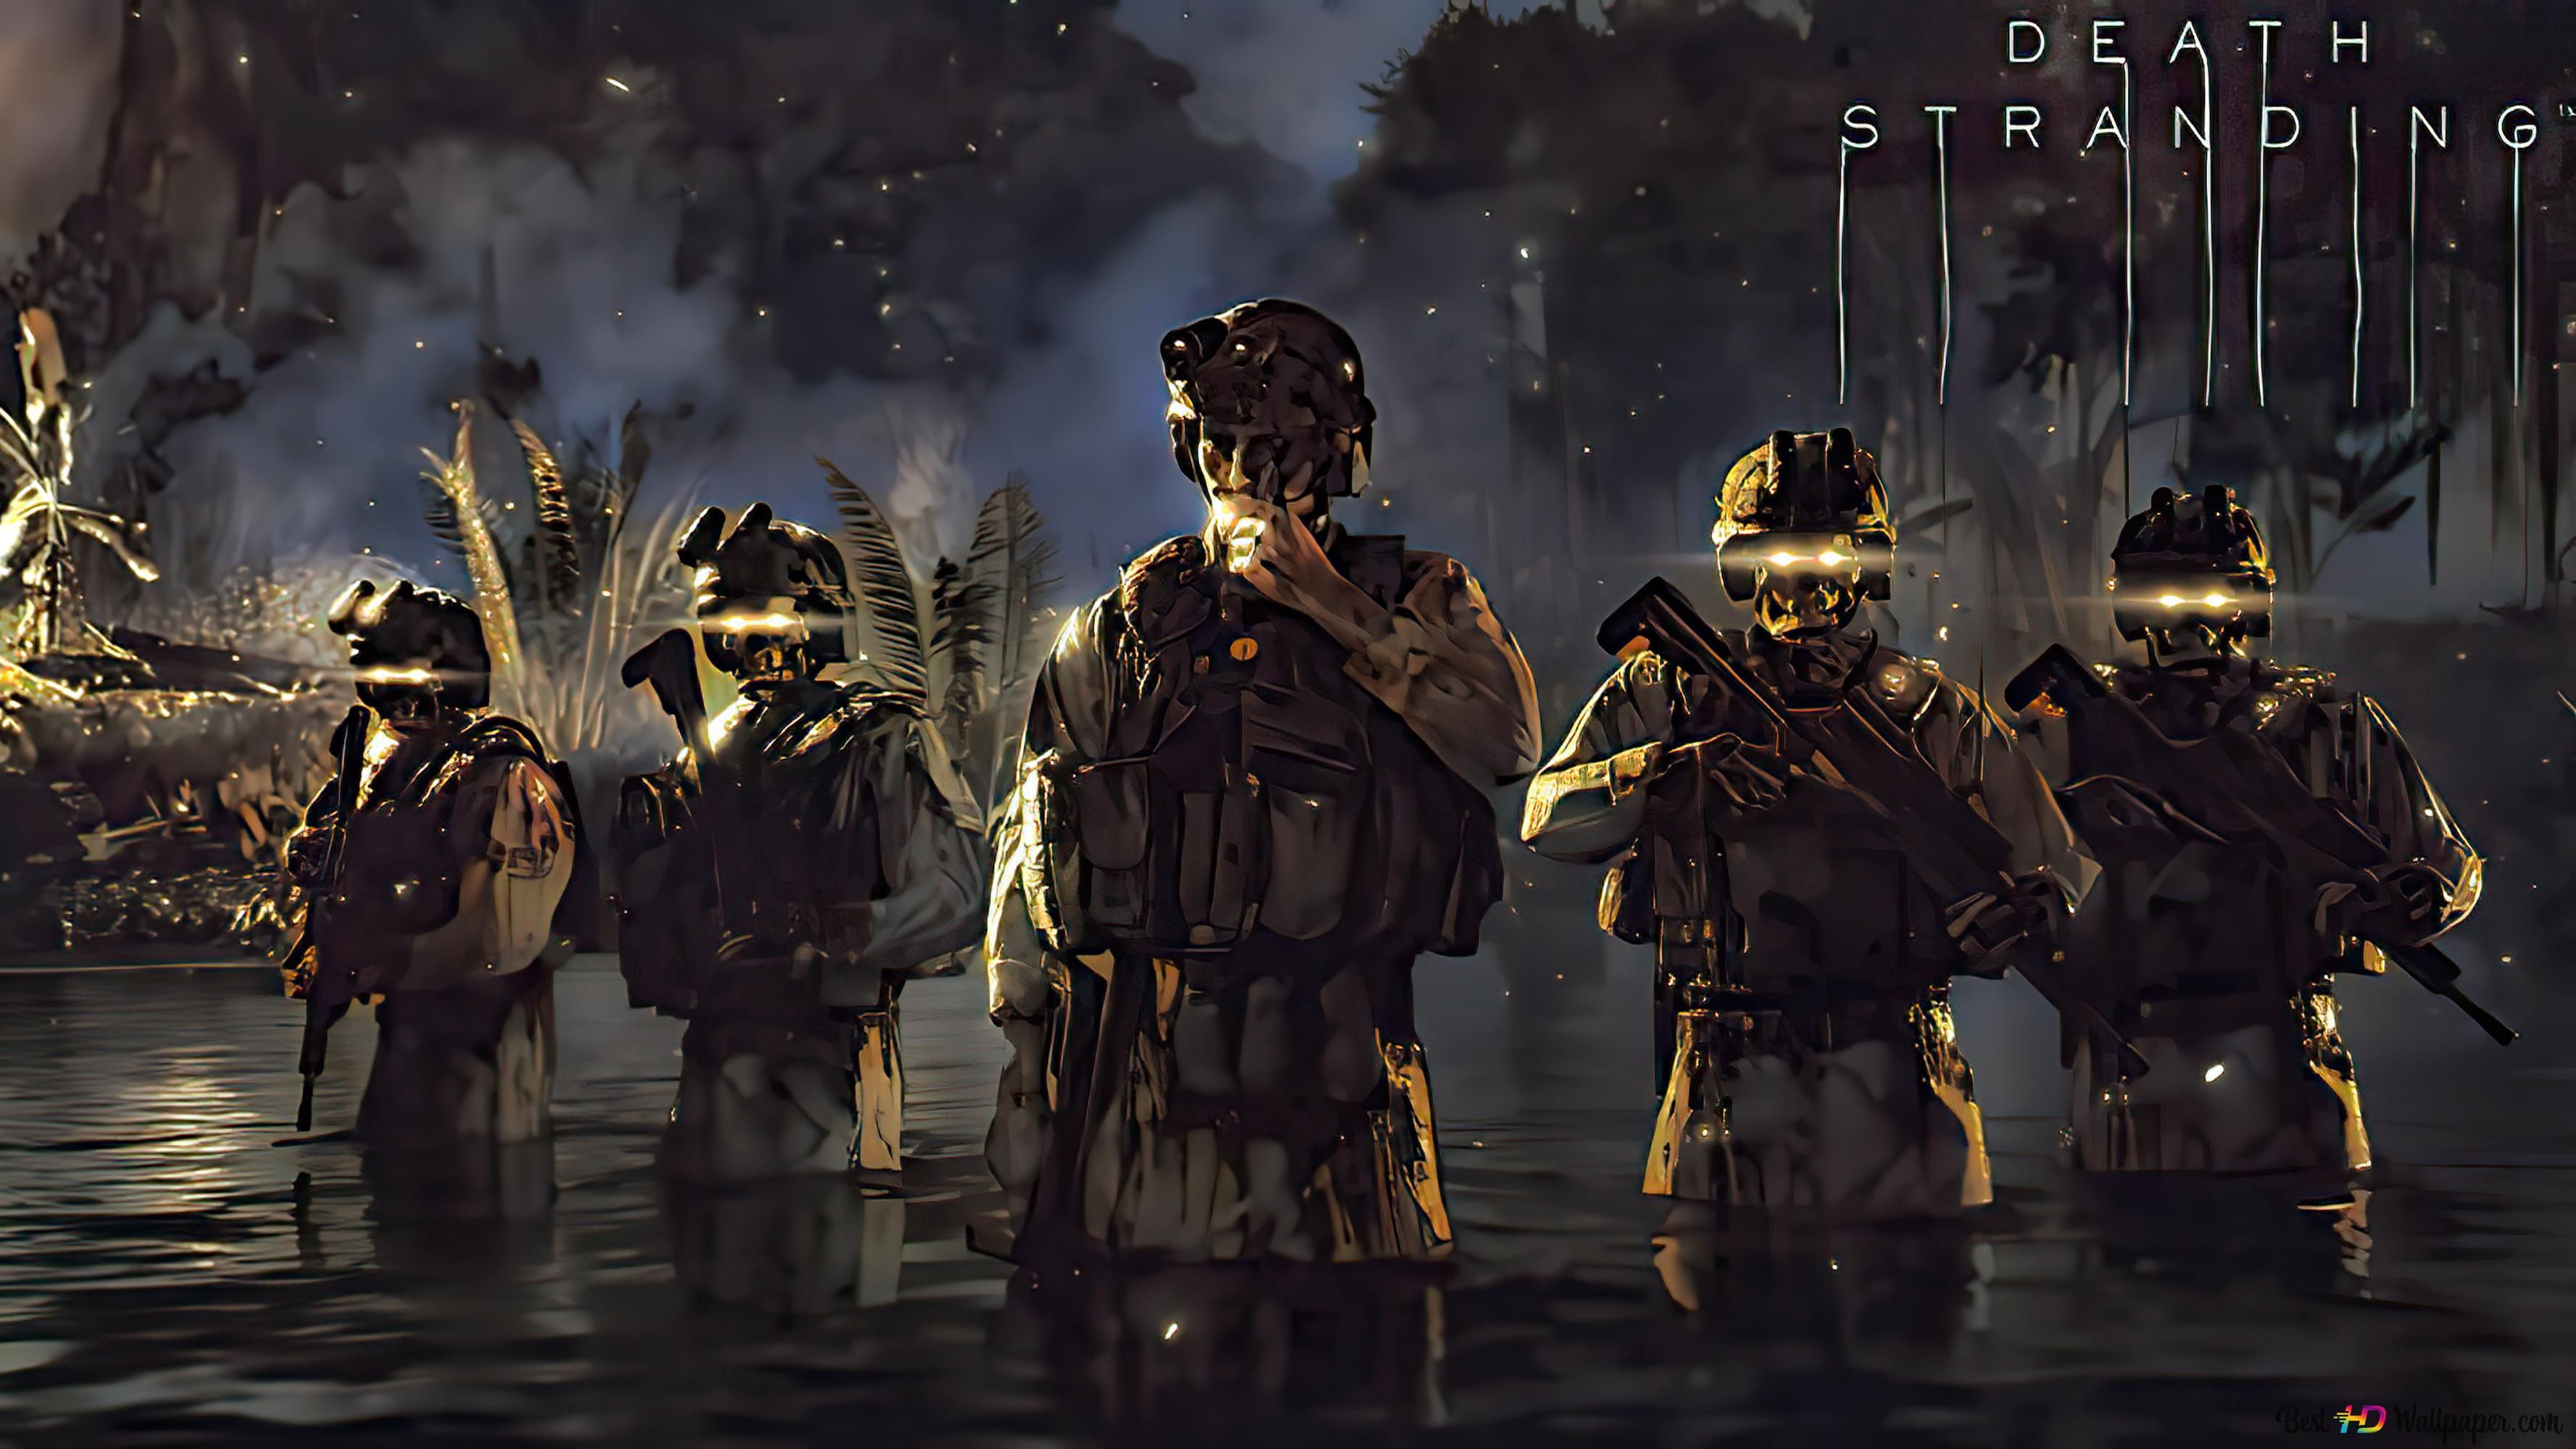 Death Stranding - CLIFF WAR 8K 4K HD wallpaper download